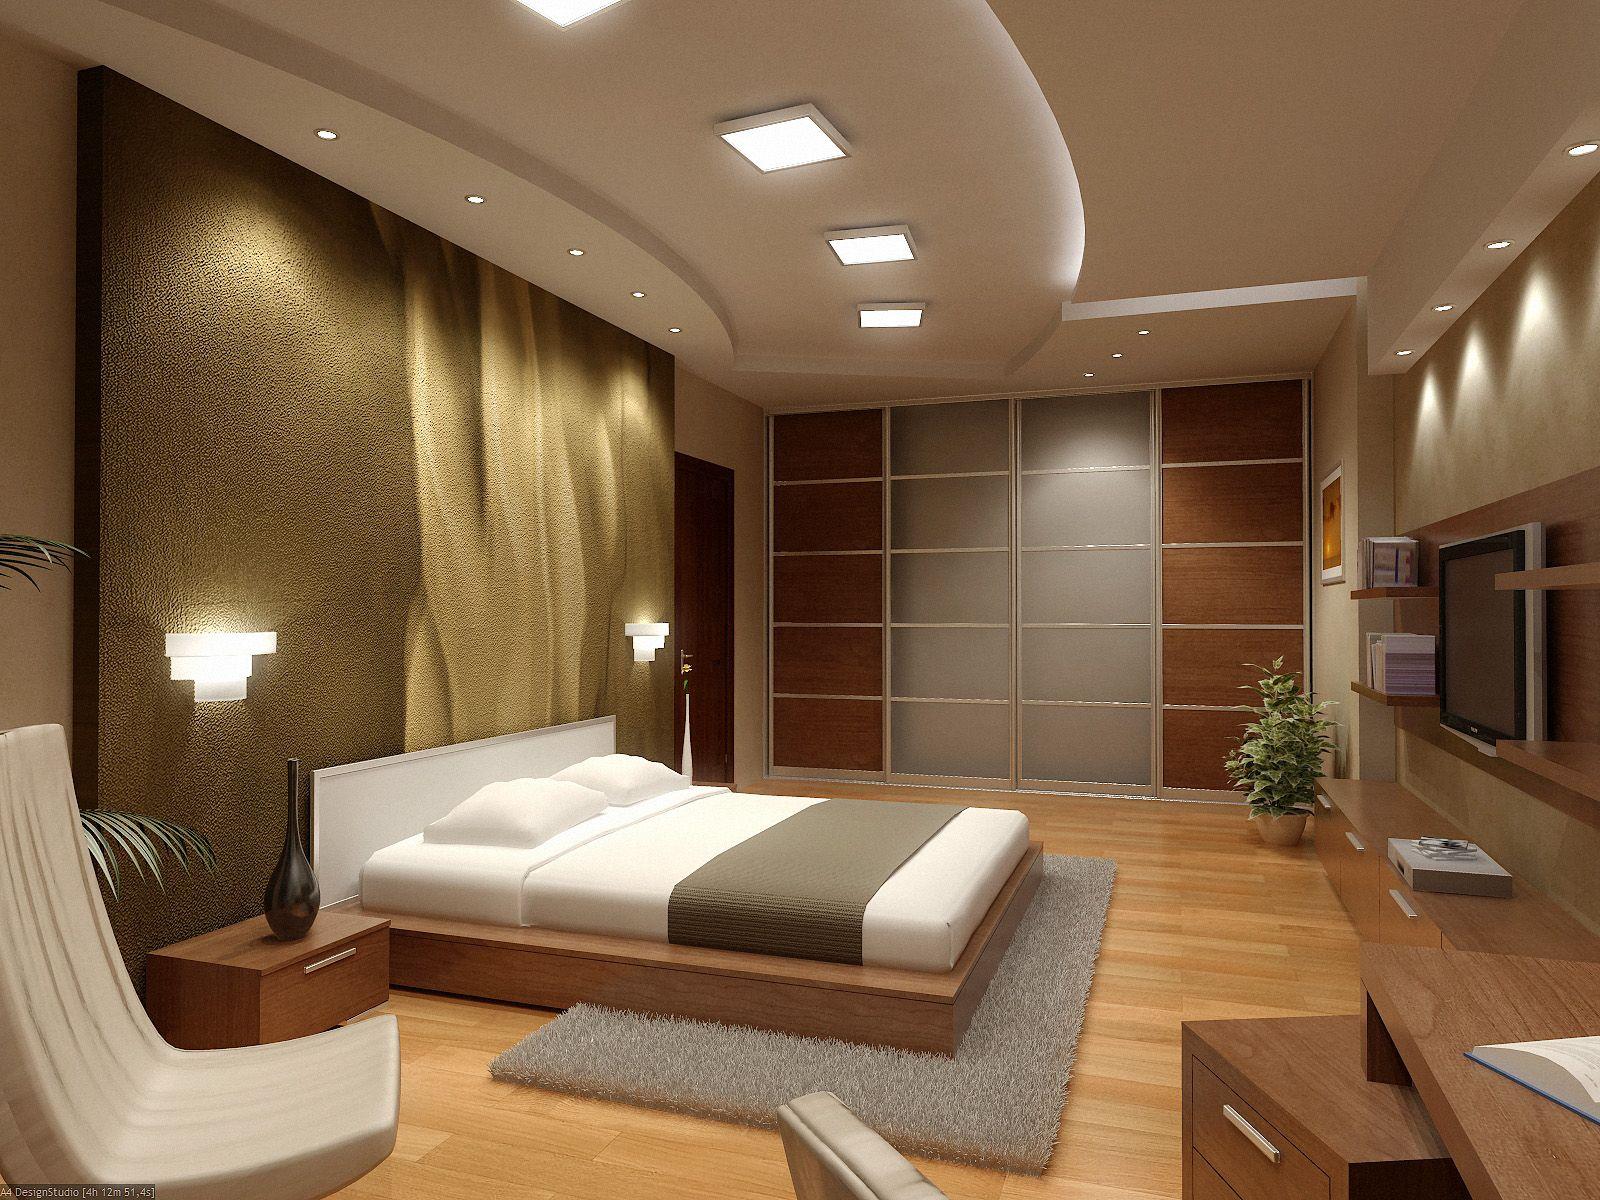 New Home Designs Latest.: Modern Homes Luxury Interior